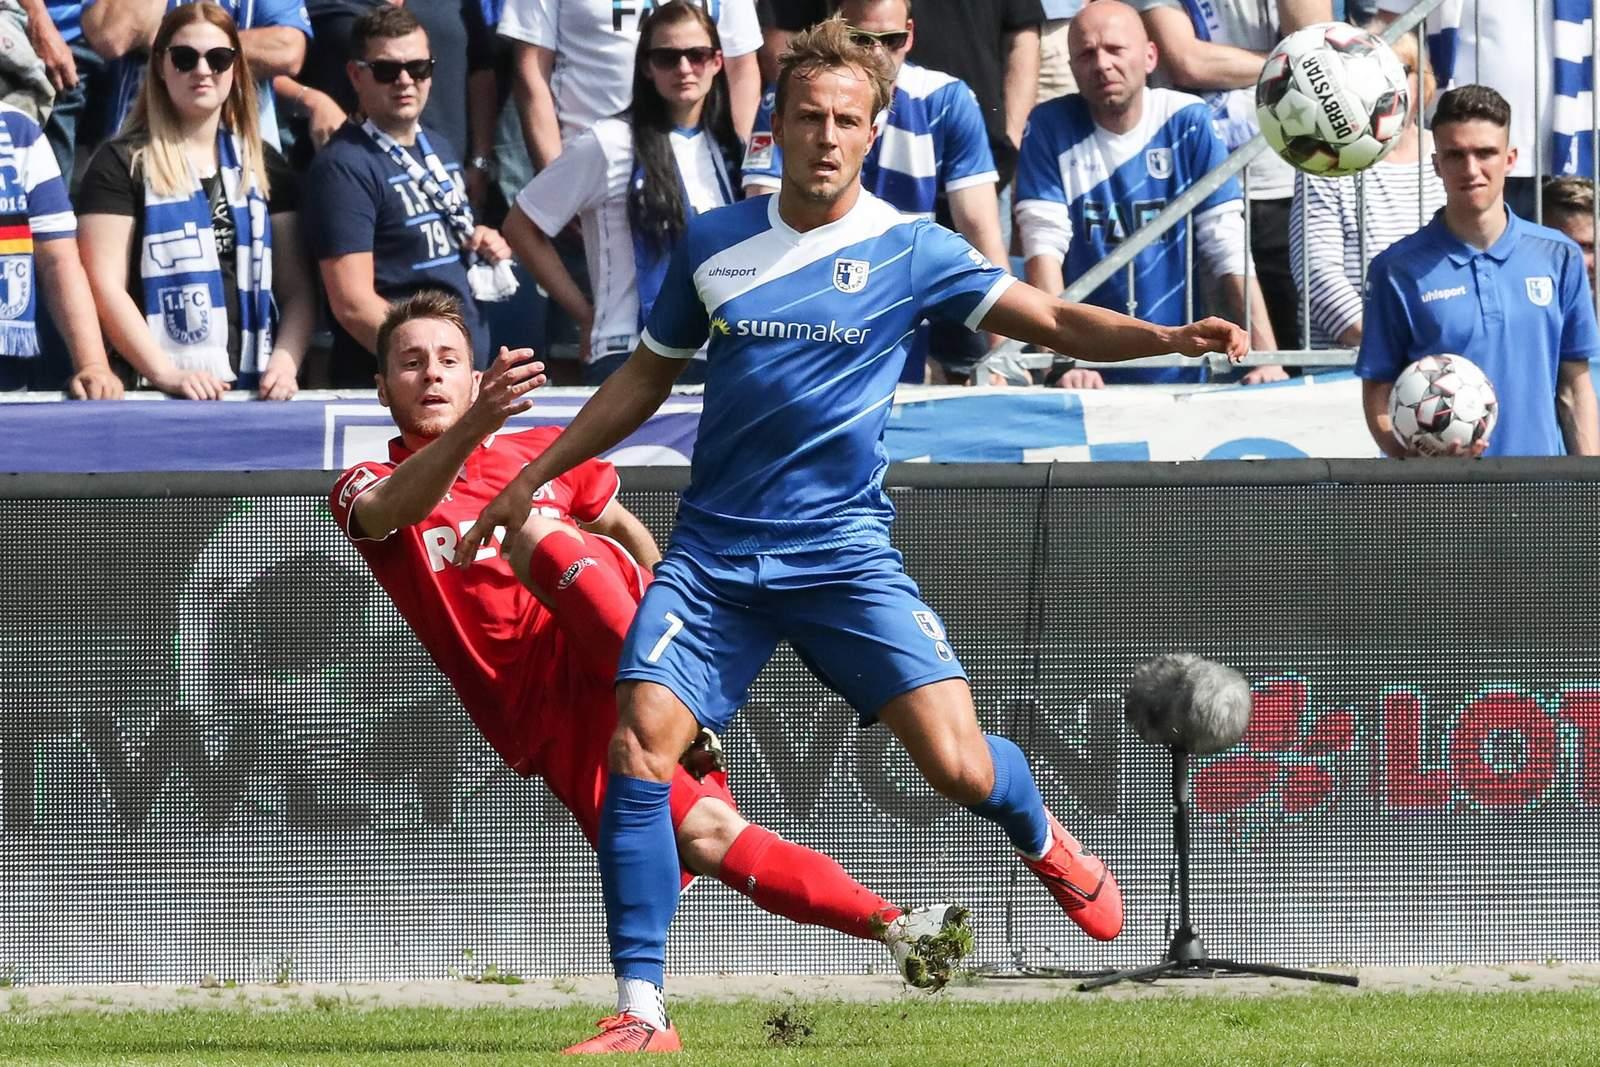 Felix Lohkemper vom 1. FC Magdeburg